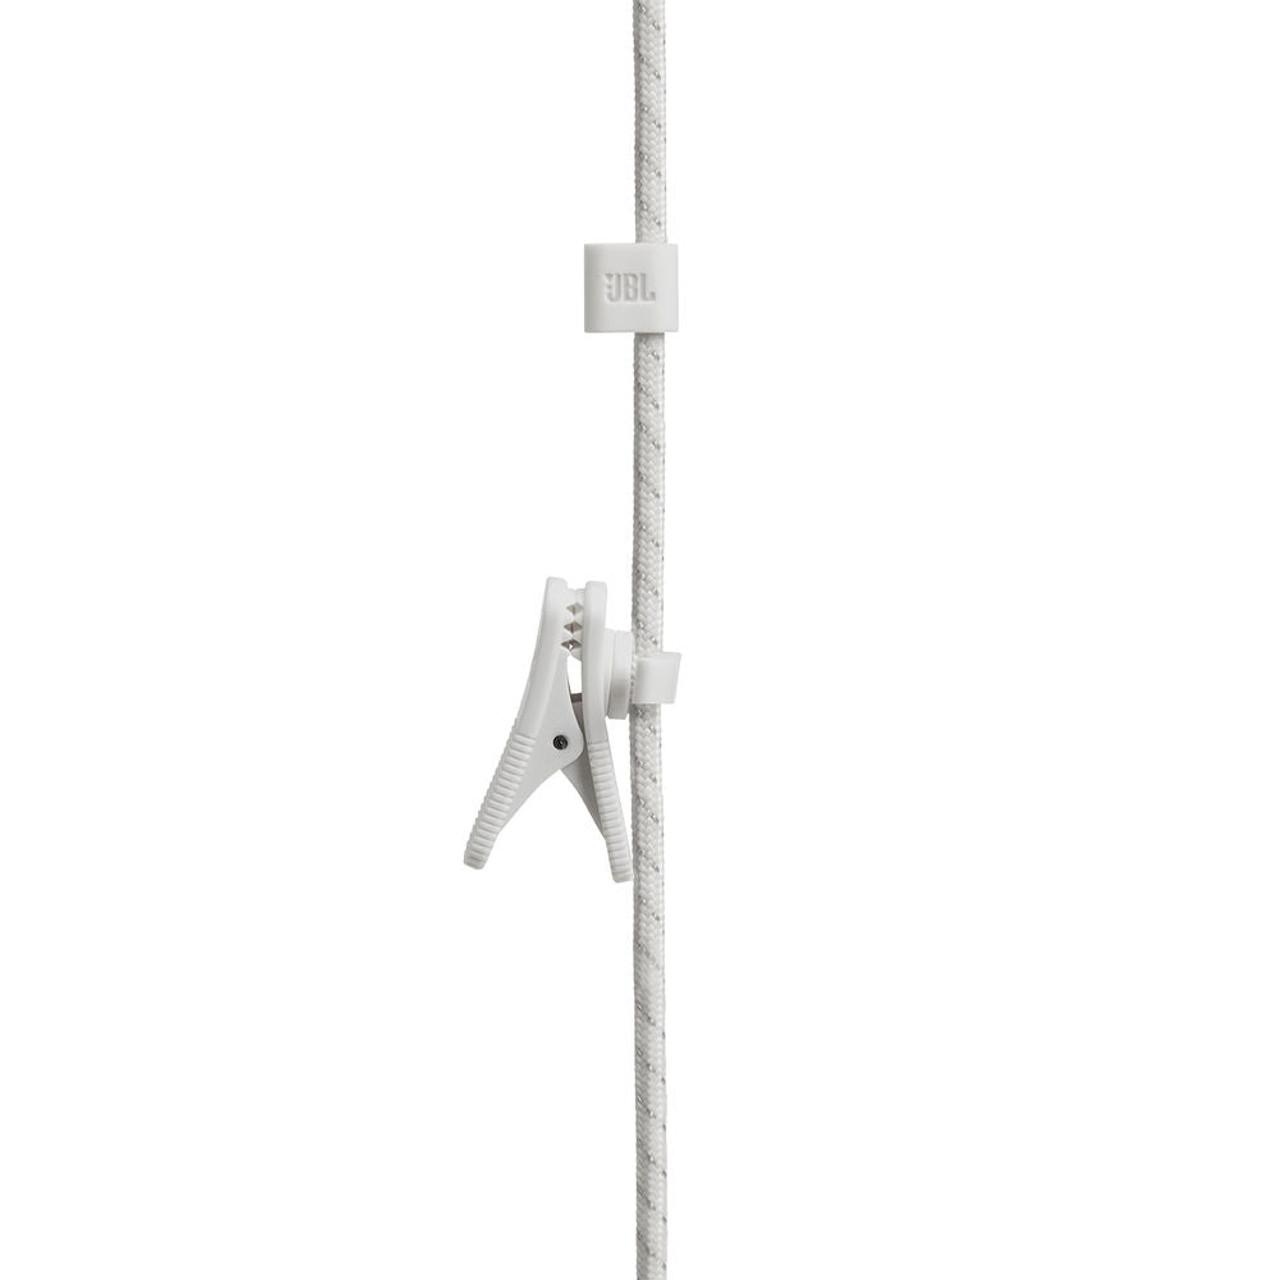 JBL UAJBLPIVOTWHTAM-Z Under Armor PIVOT Wireless in-ear Headphones, White - Certified Refurbished